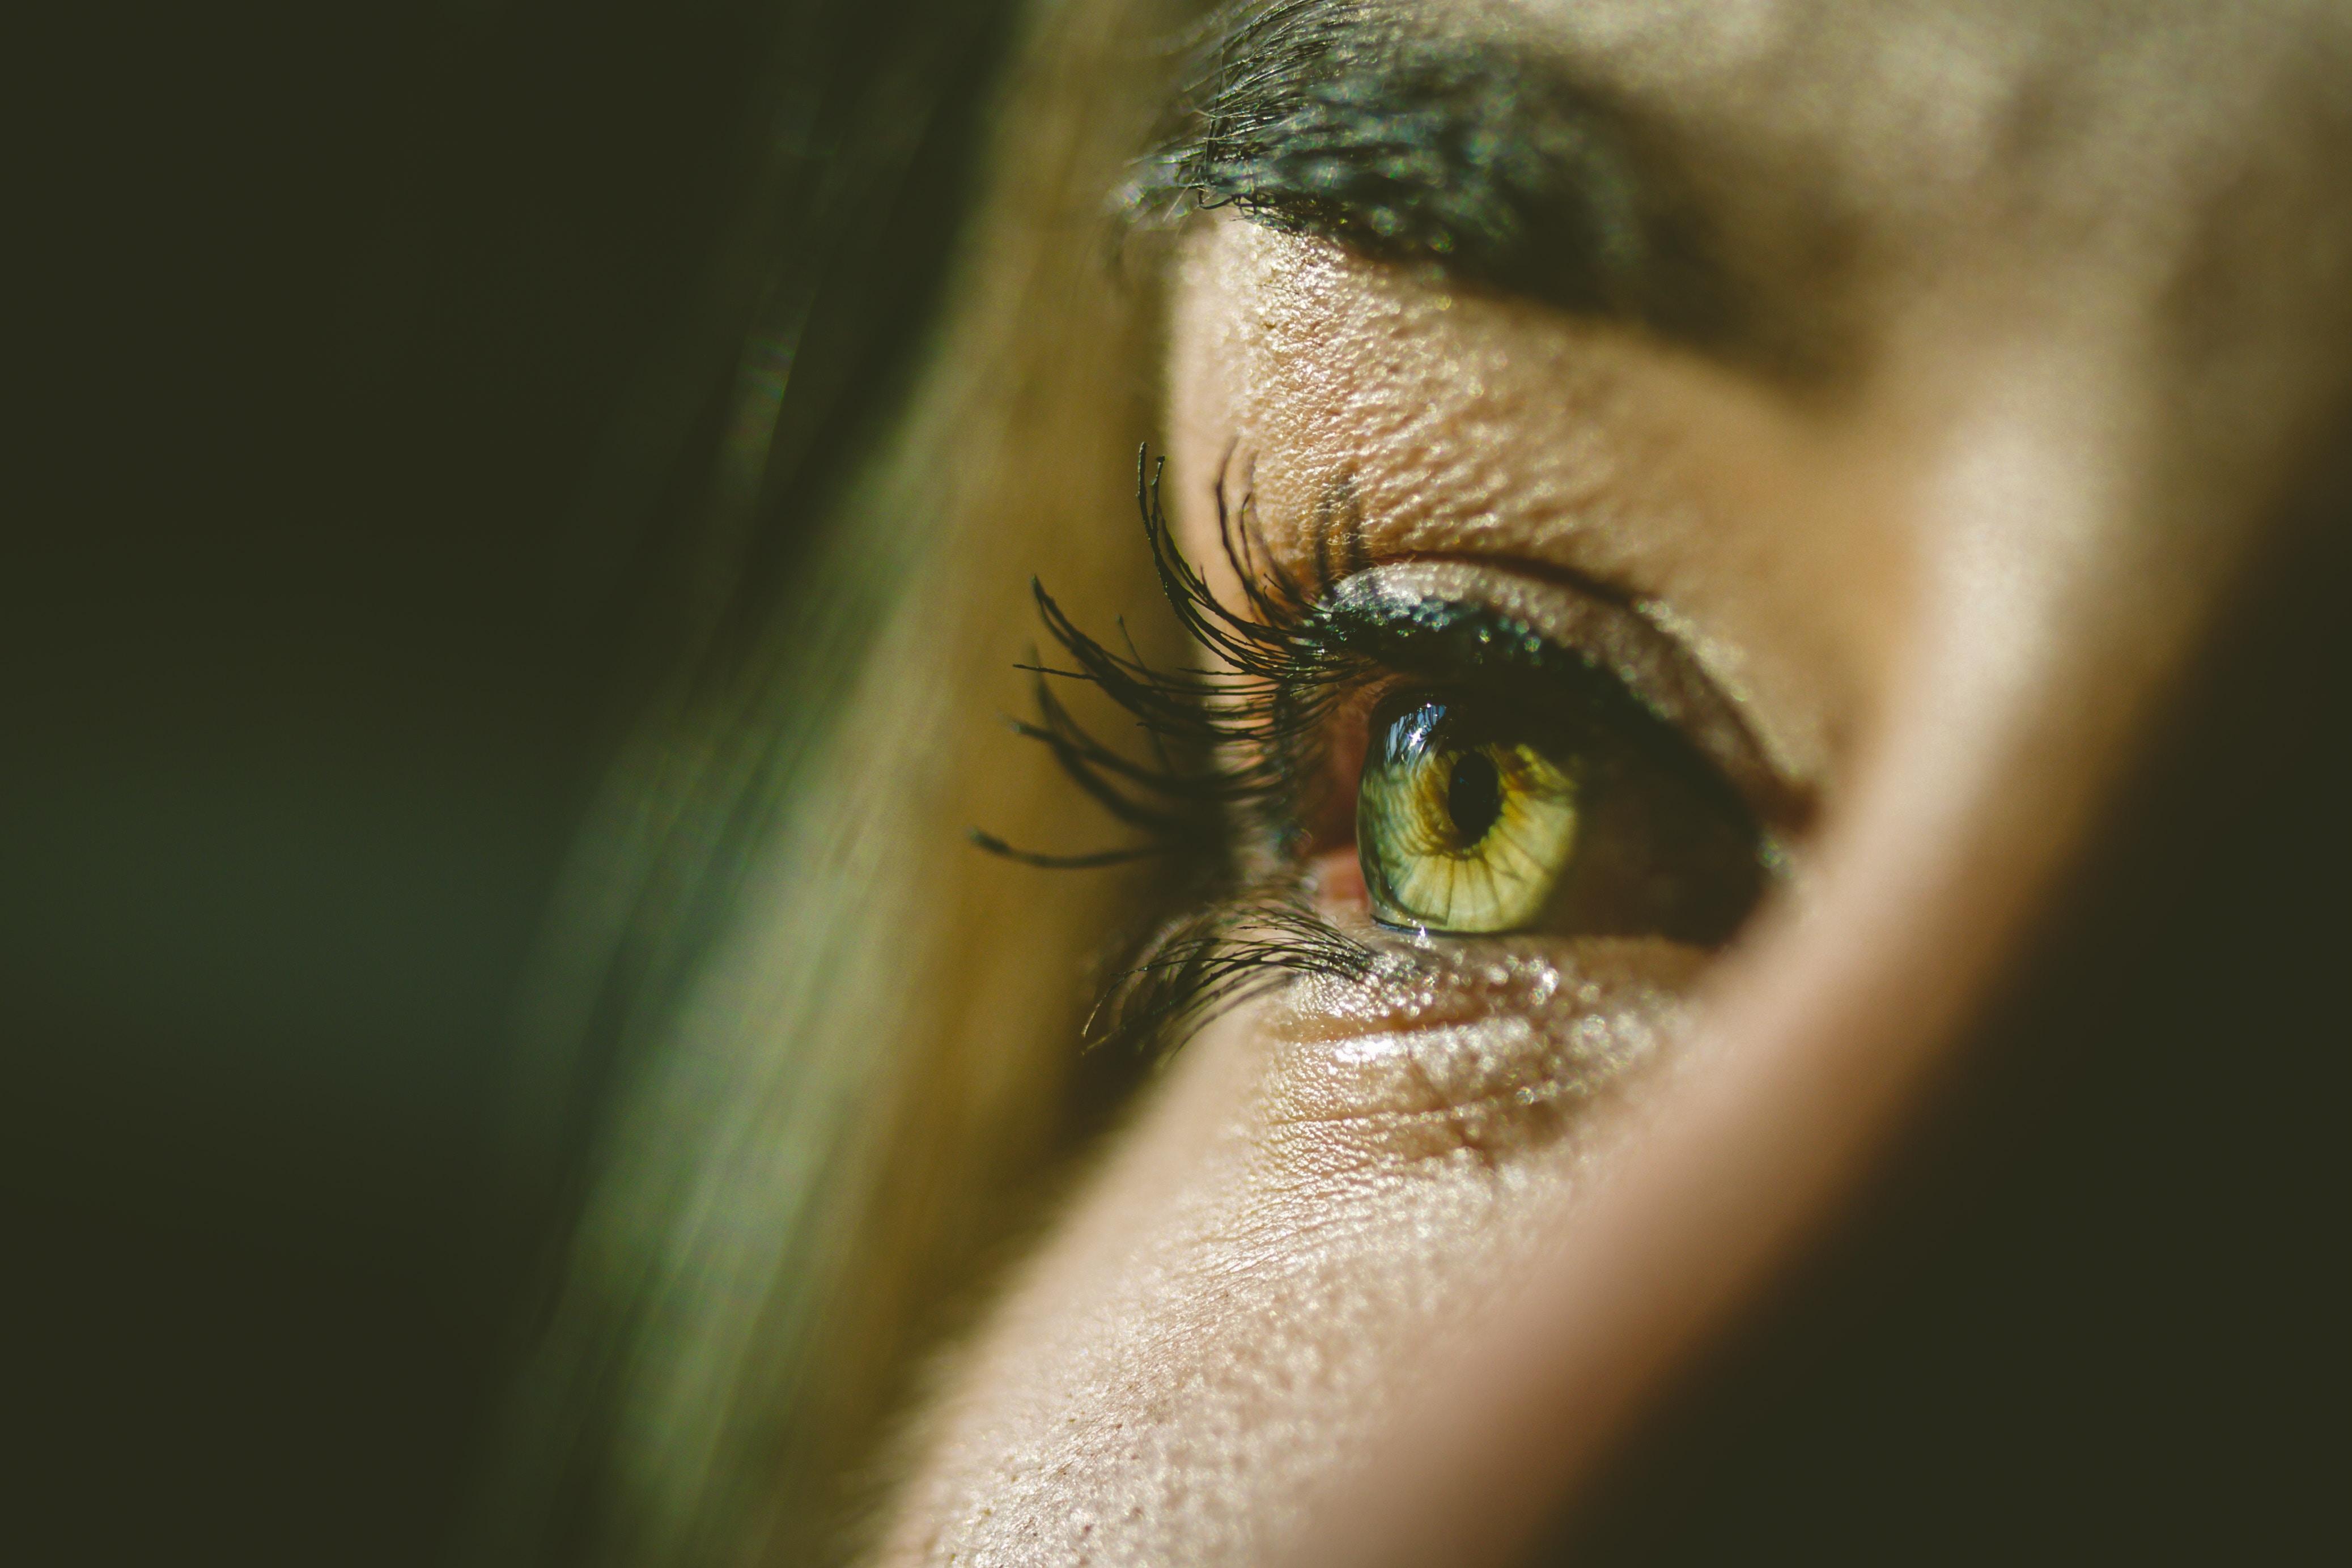 selective-focus photograph of person's eye